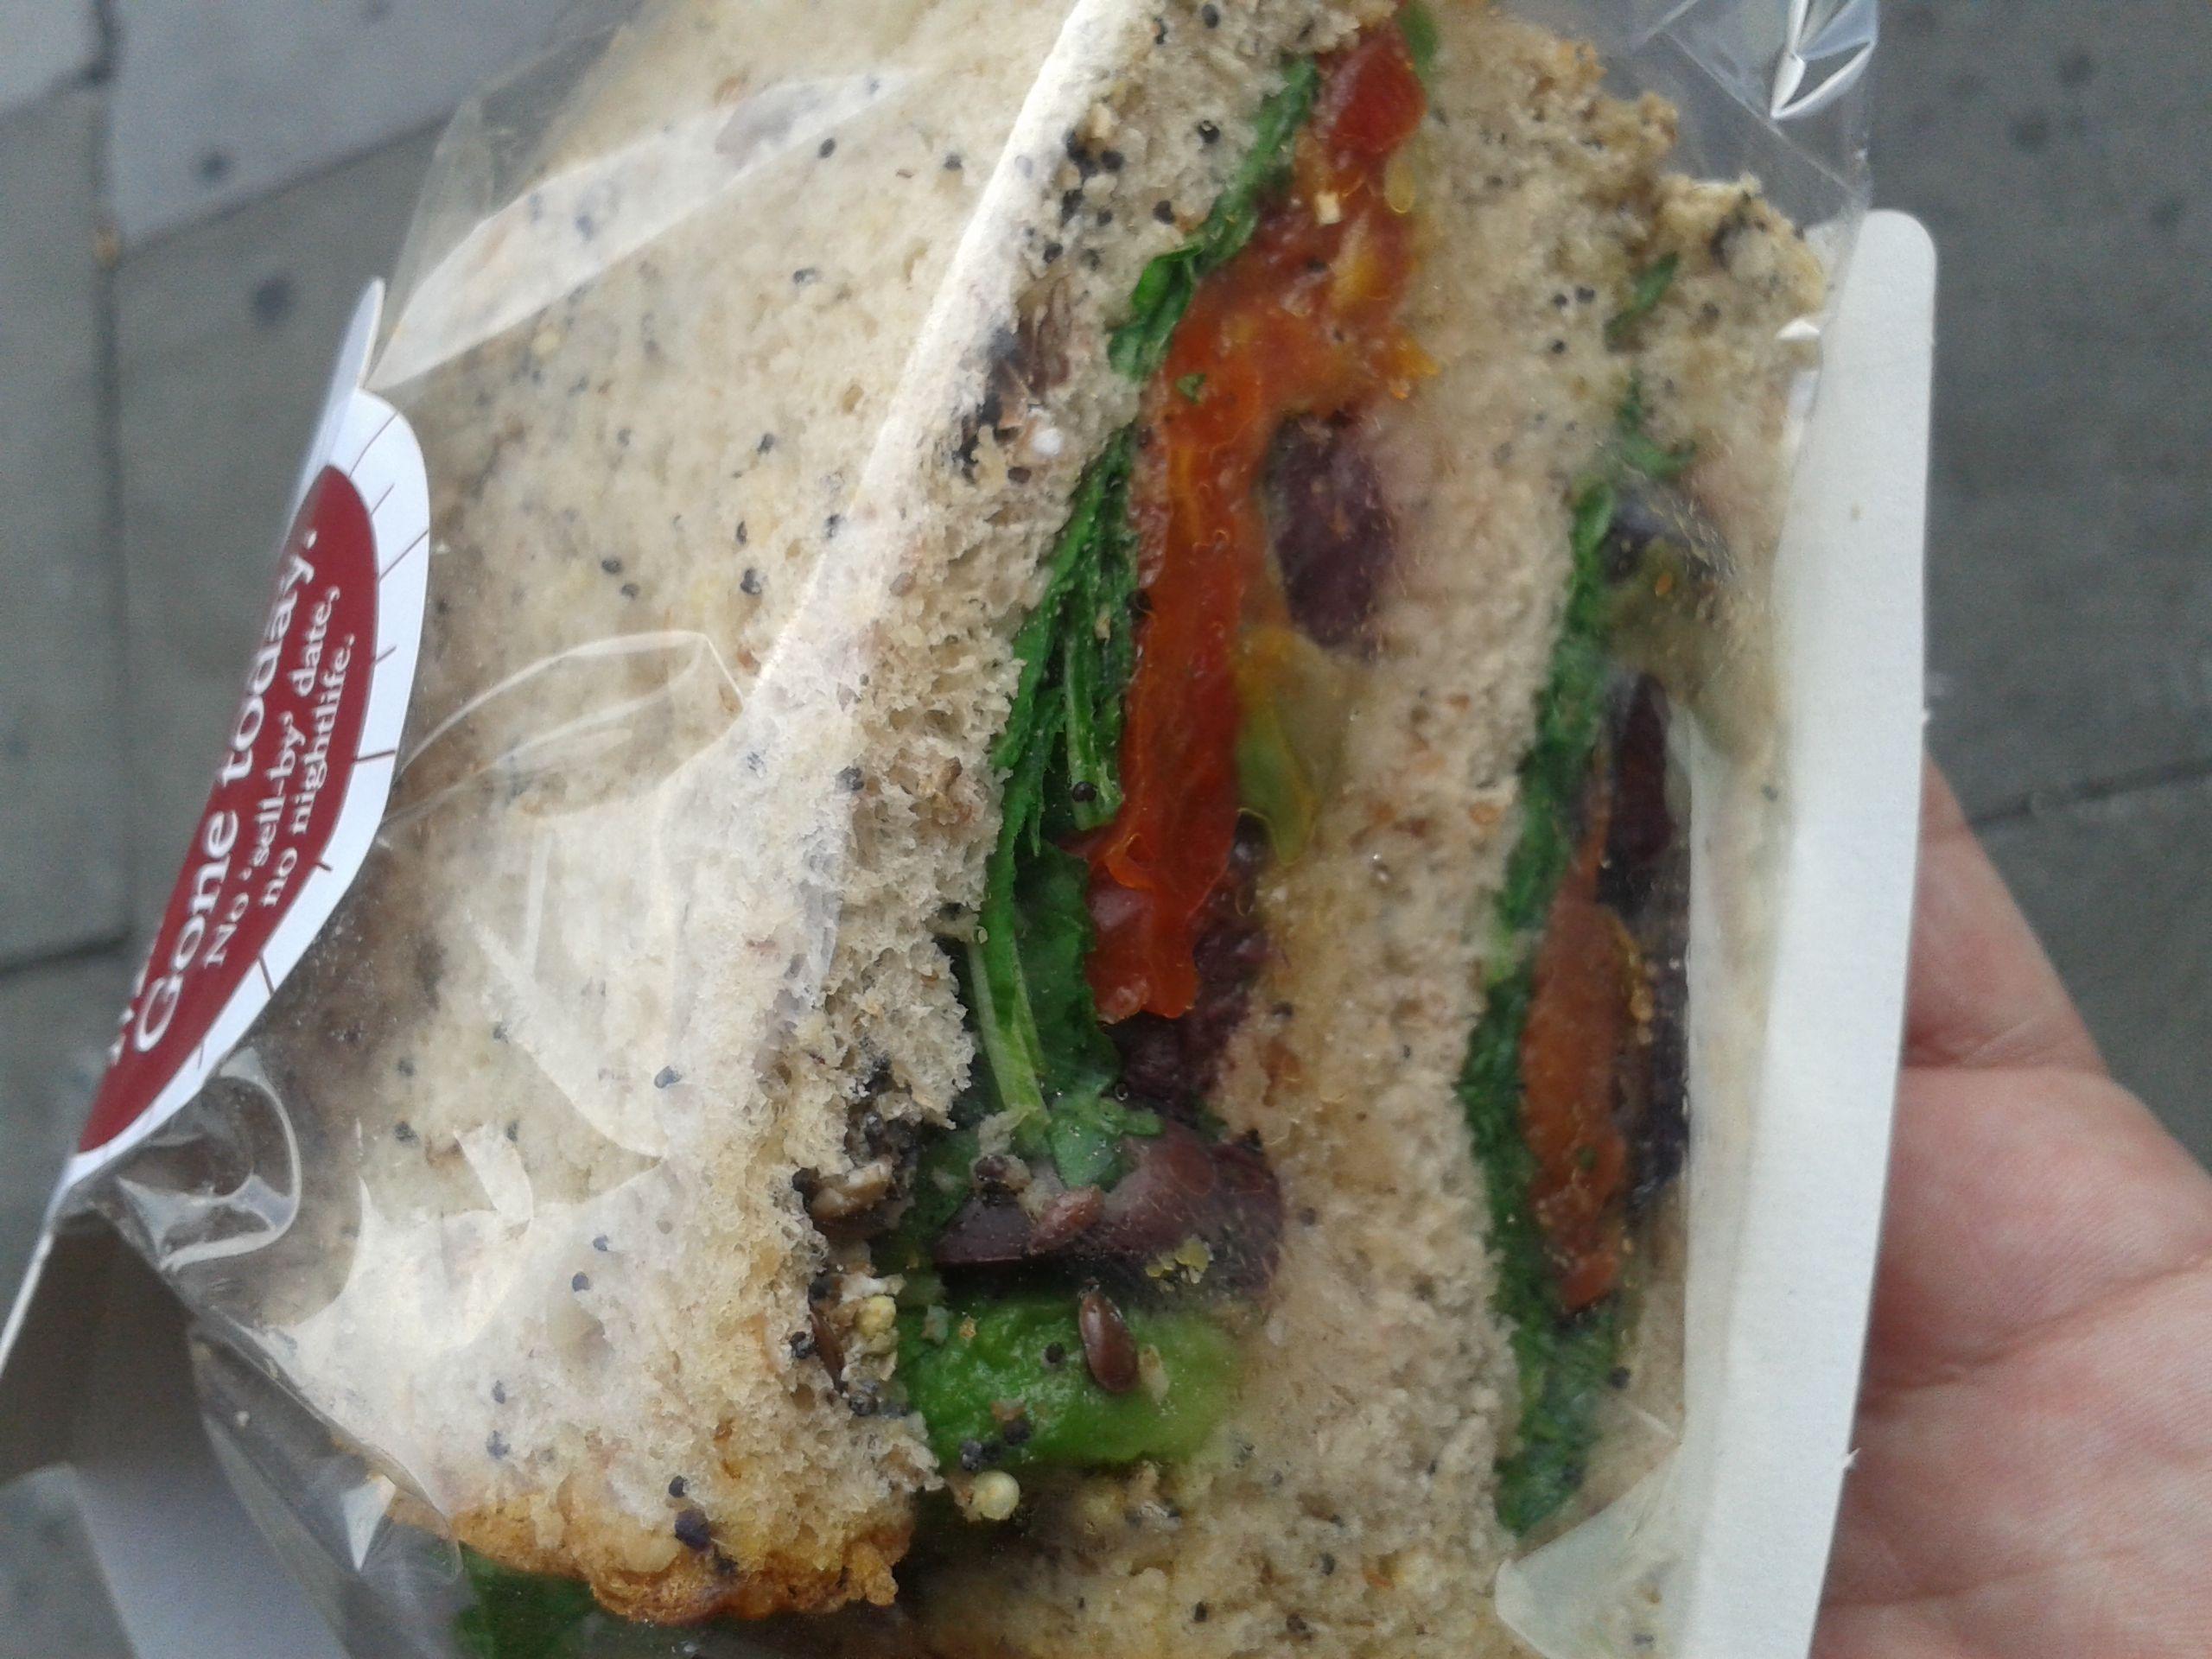 https://i1.wp.com/fatgayvegan.com/wp-content/uploads/2013/09/sandwich1.jpg?fit=2560%2C1920